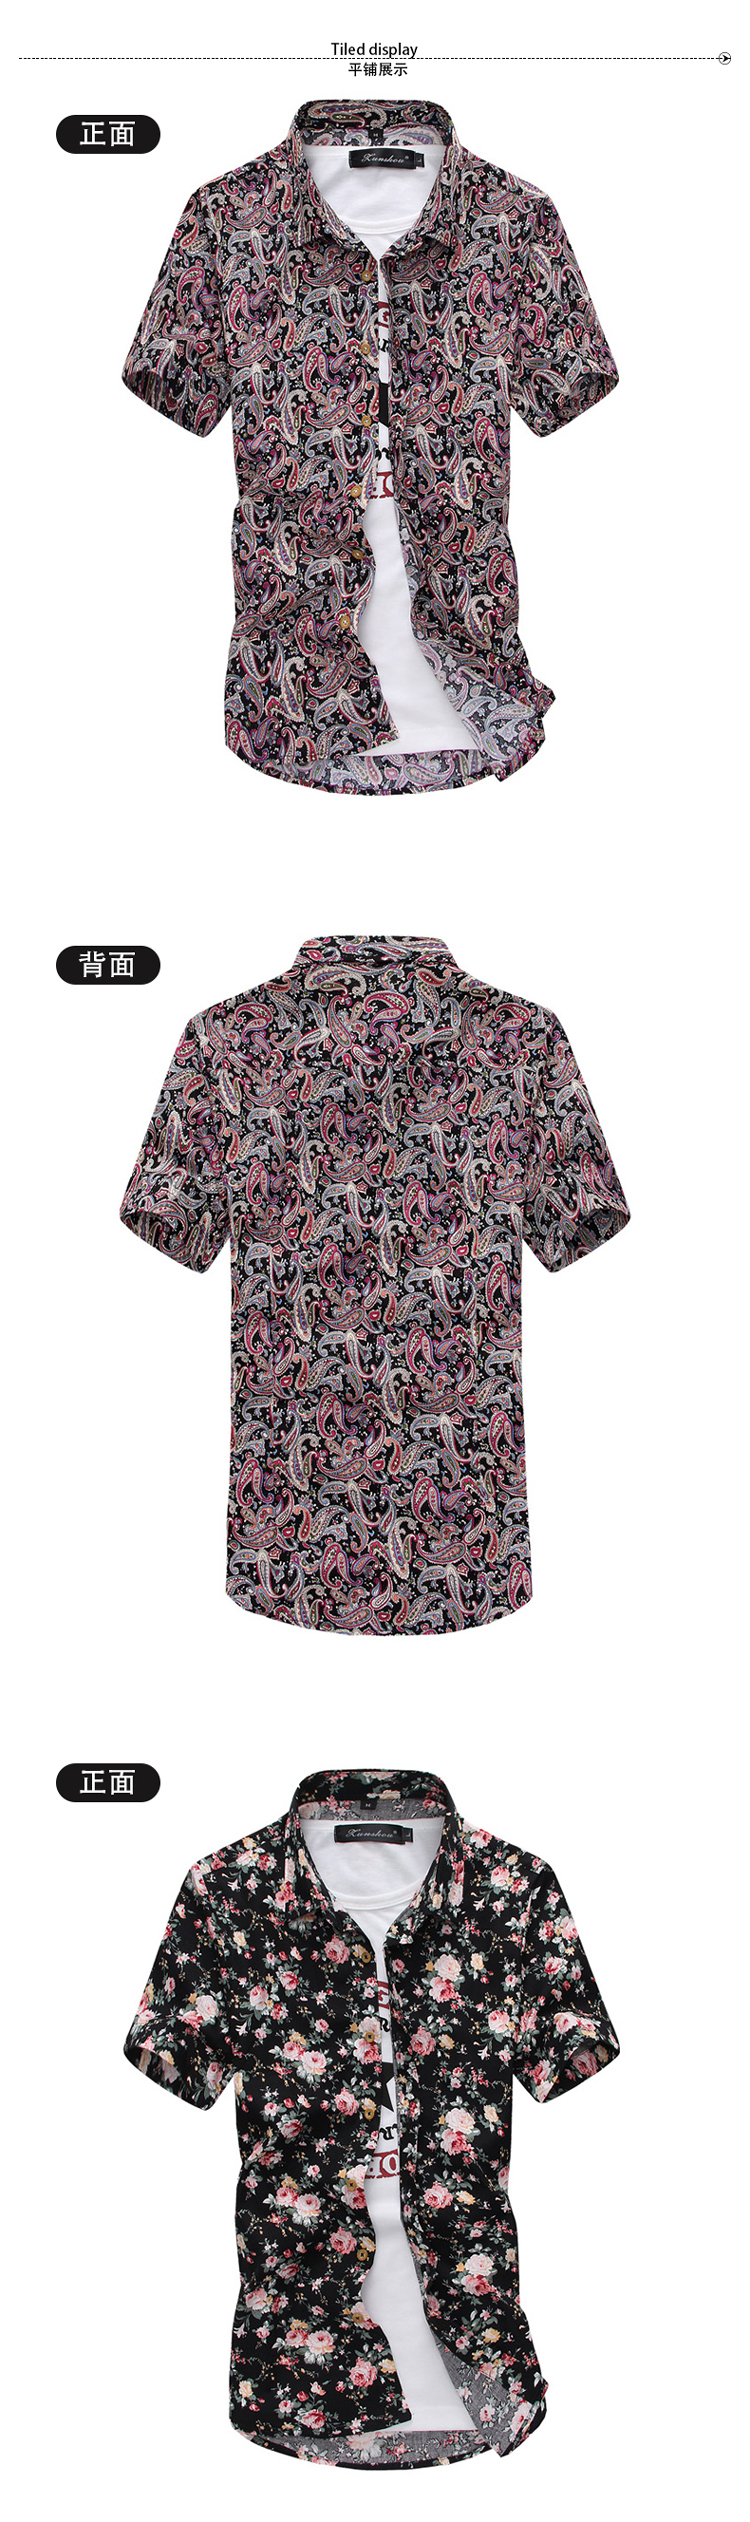 Men Summer Thin Shirts Short Sleeve Floral Shirts New Fashion Men Outwear Casual Slim Shirts Mens Cotton dress shirts 12